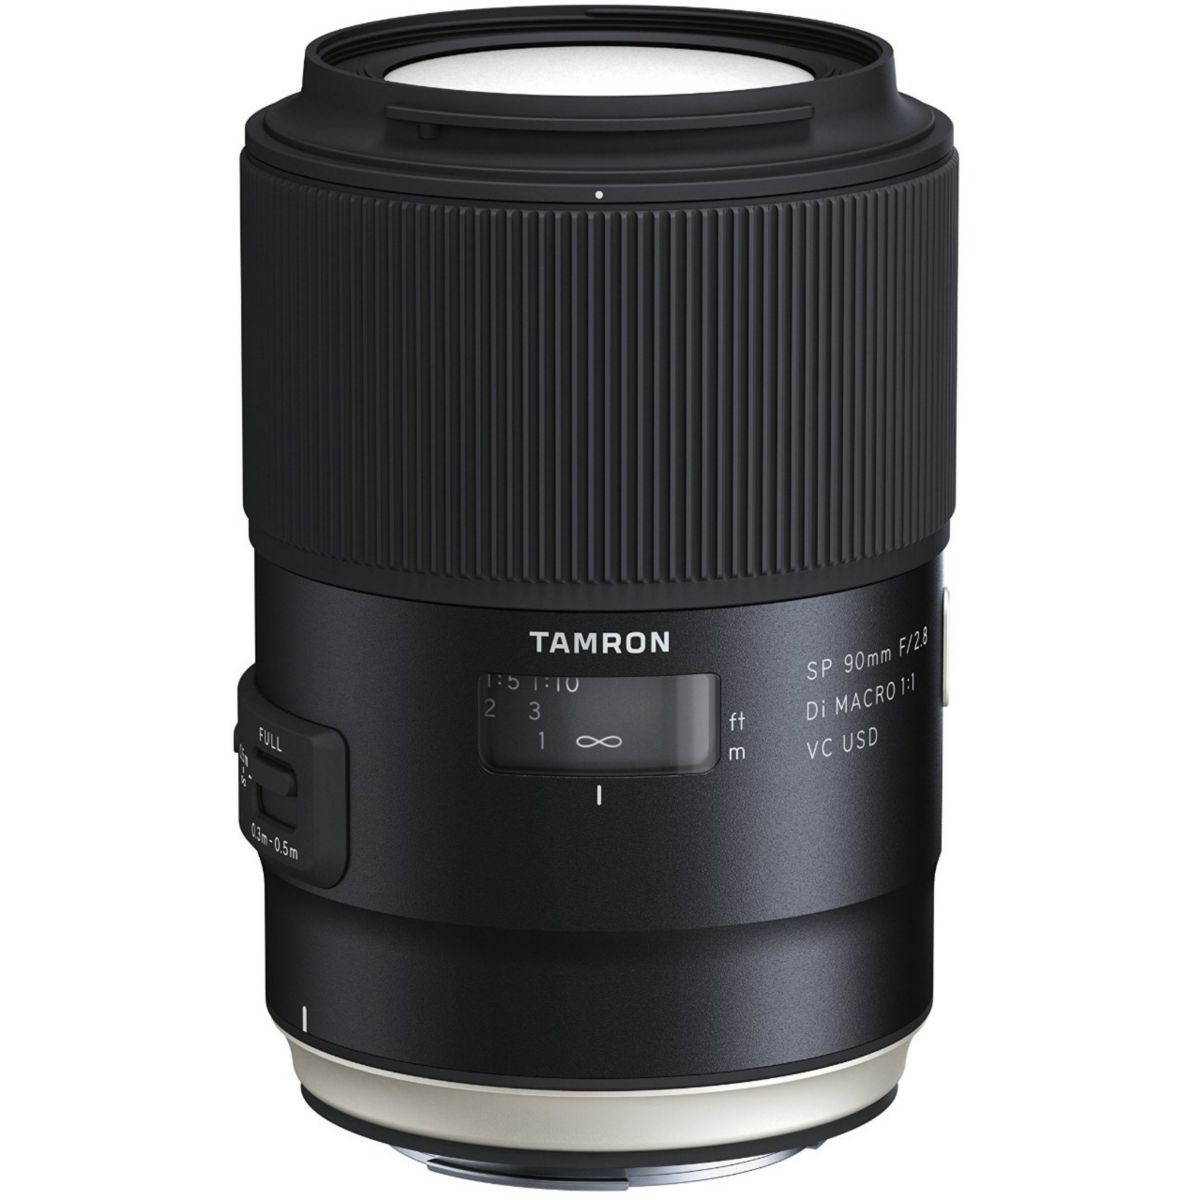 Objectif pour Reflex TAMRON SP 90mm F2.8 Di Macro VC USD Canon